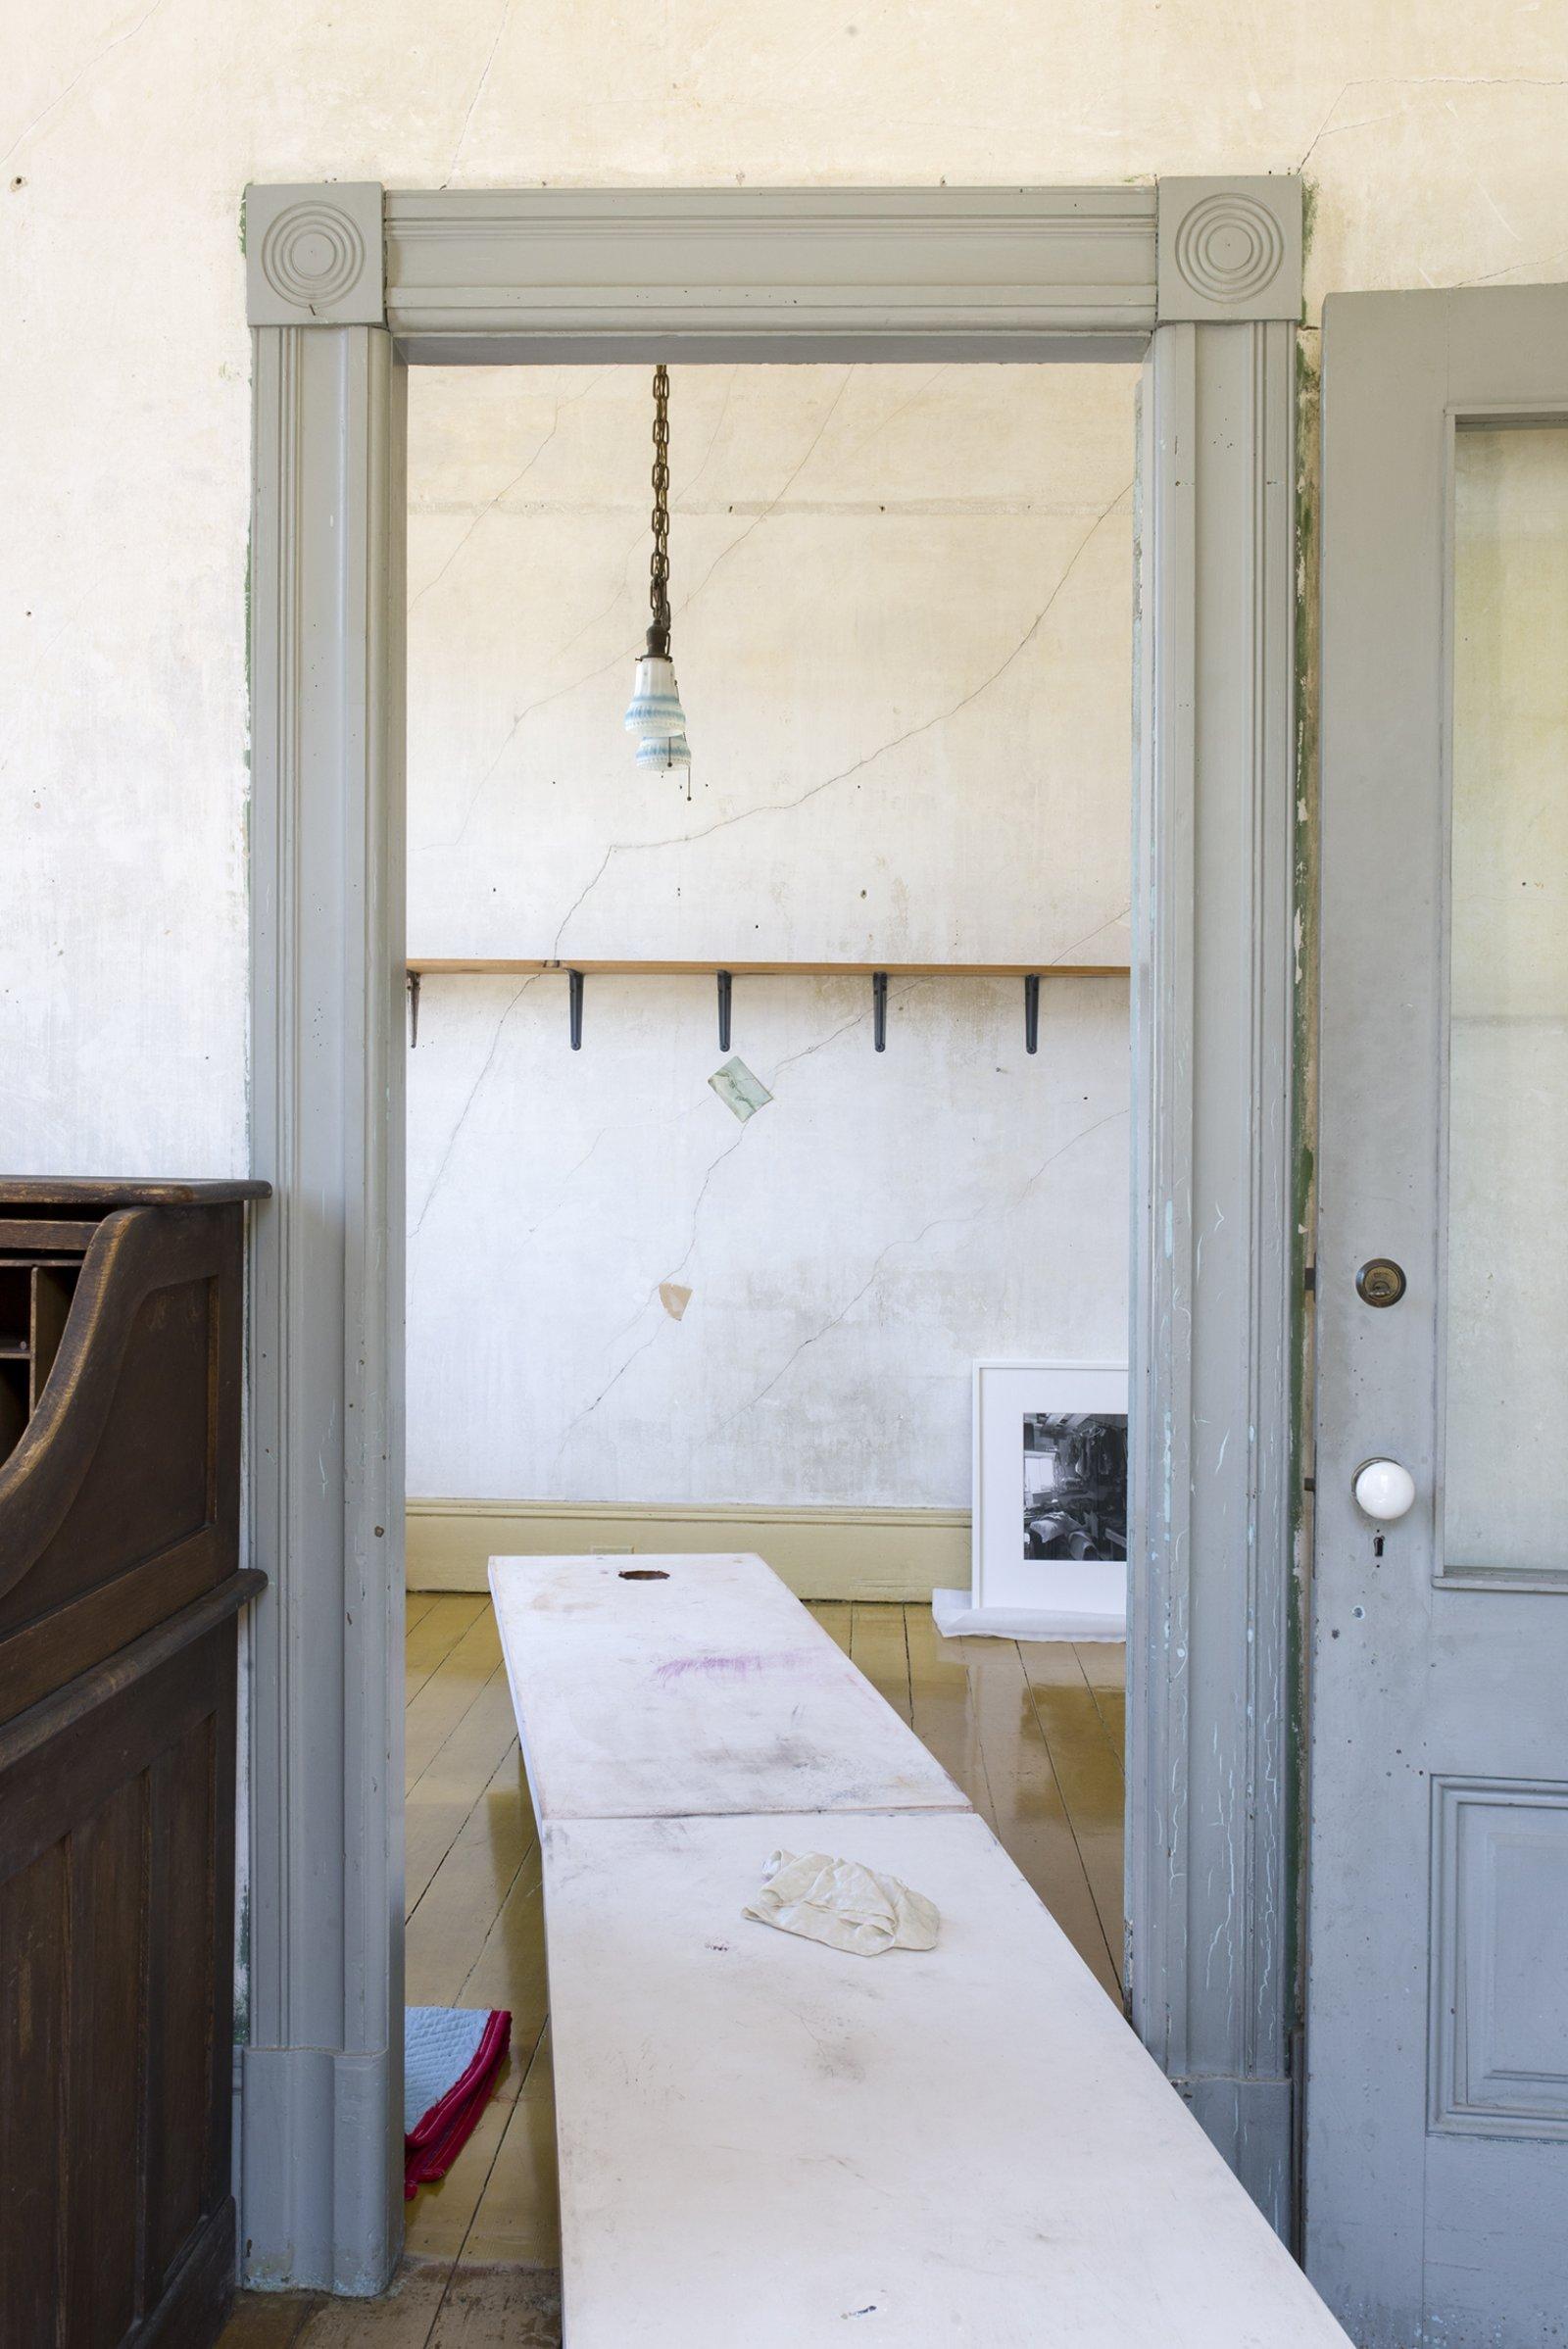 Liz Magor, Long Table (ashtray), 2006–2018, polymerized gypsum, 22 x 24 x 78 in. (56 x 61 x 198 cm). Installation view, TIMESHARE, The David Ireland House, 500 Capp Street Foundation, San Francisco, USA, 2019 by Liz Magor